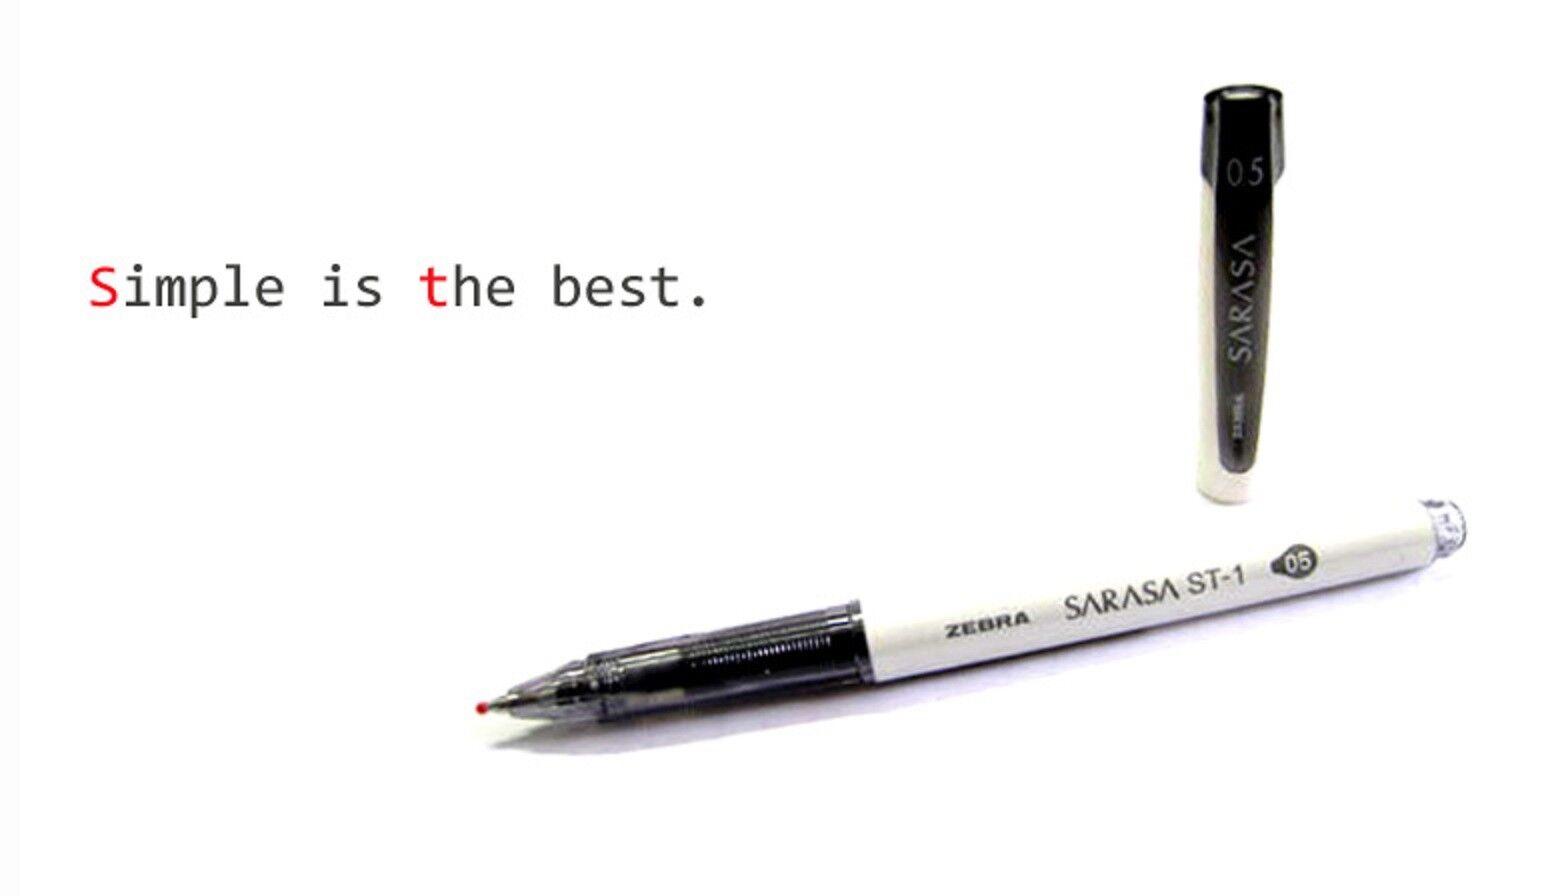 Zebra JJZ58 SARASA ST-1 Rollerball pen 0.5mm 9 Colors Select